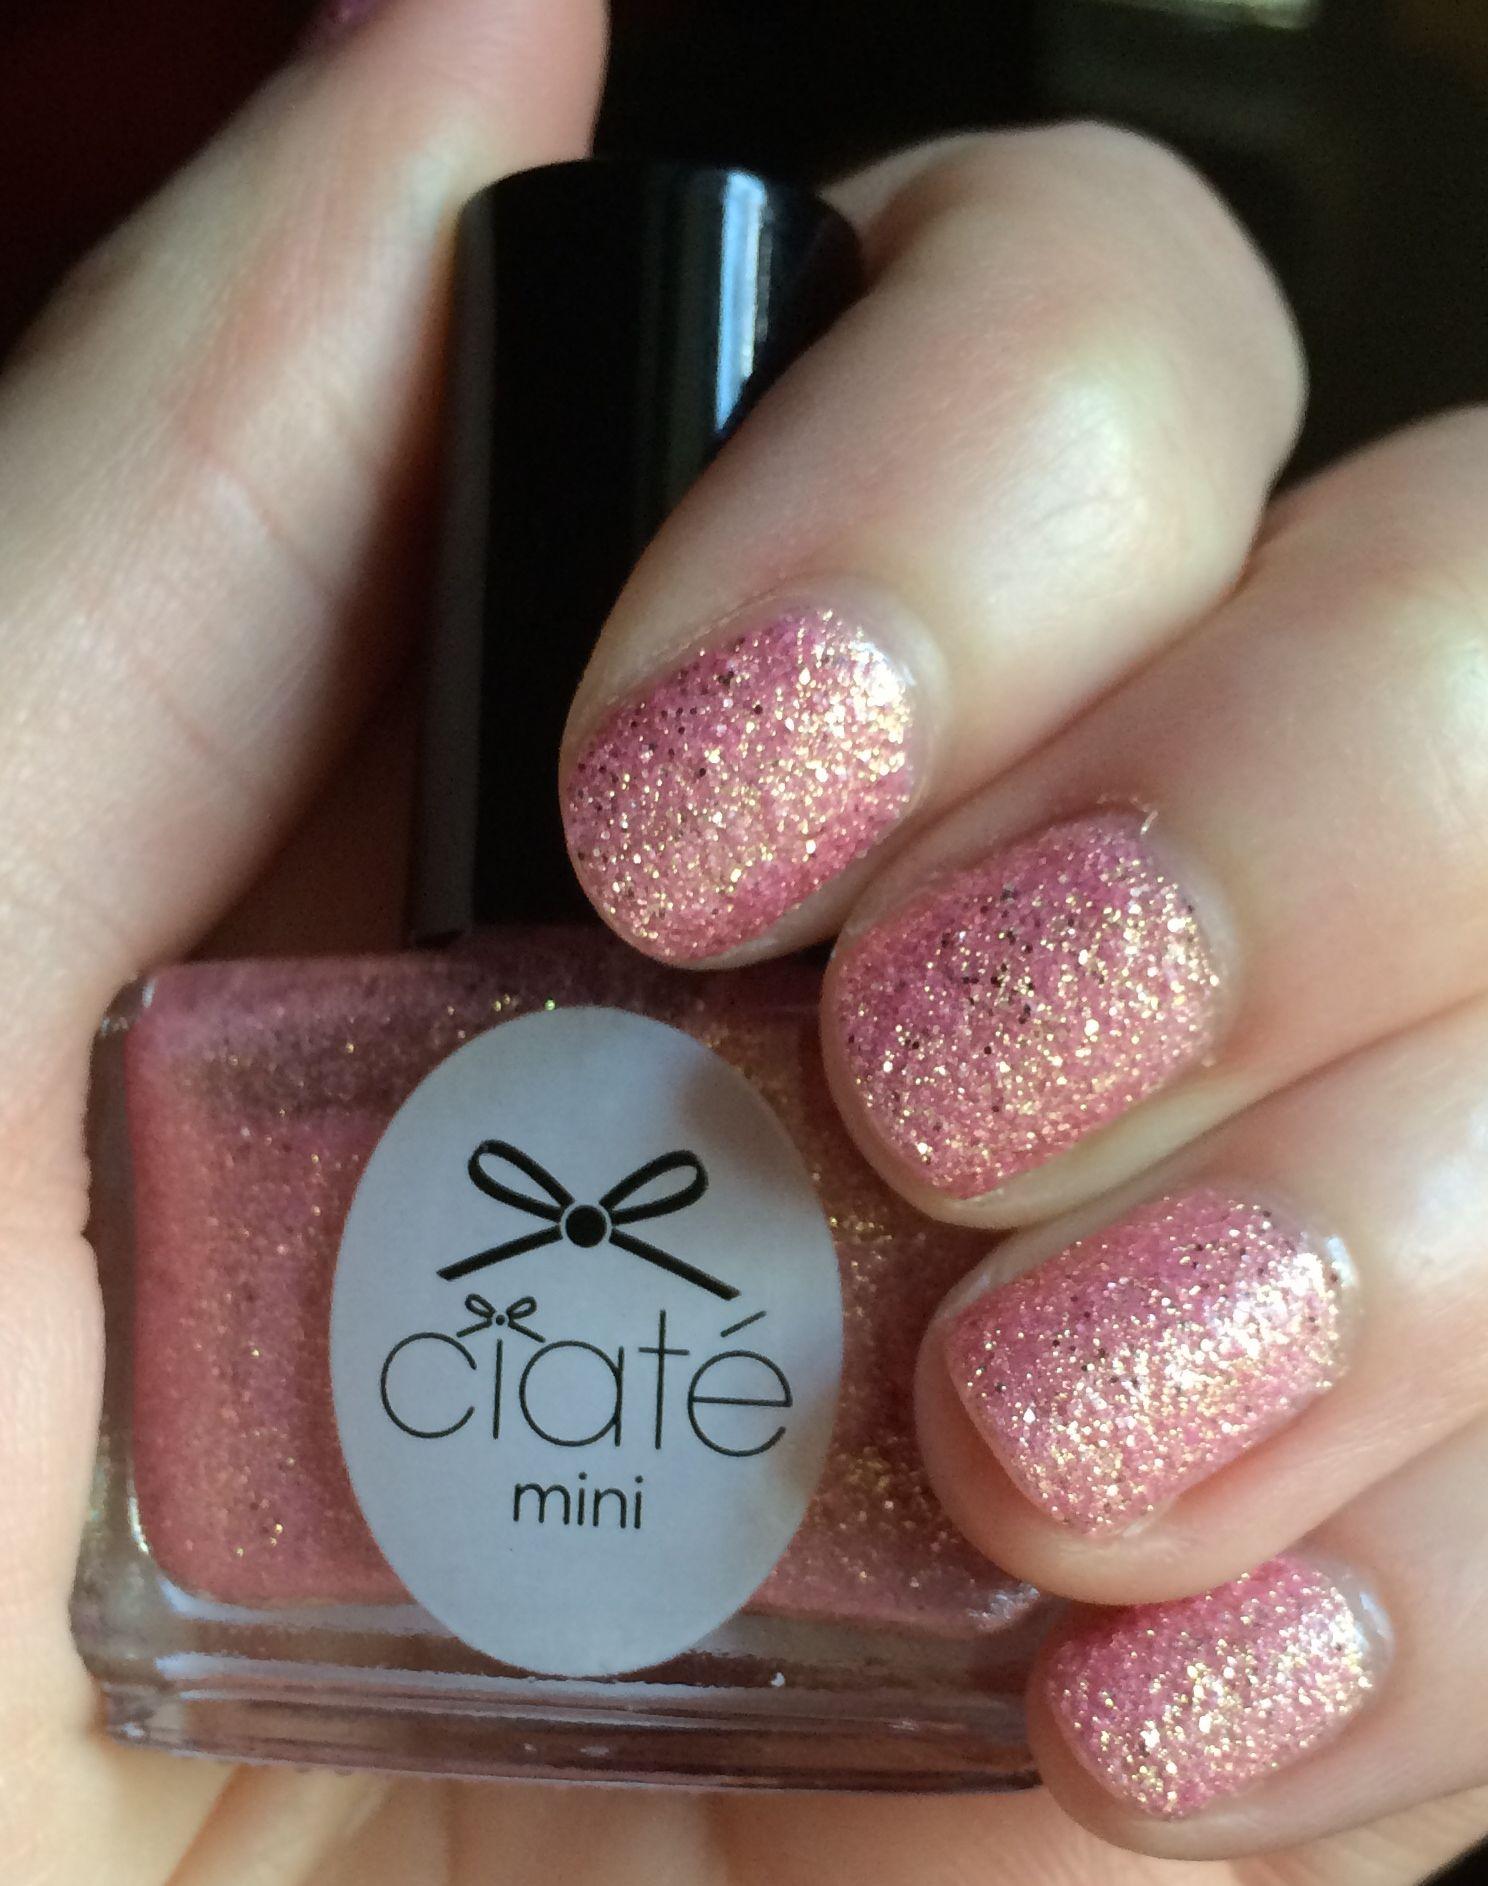 Ciate Mini Paint Pot In Mineral Love Textured Polish Painted Pots Minerals Nail